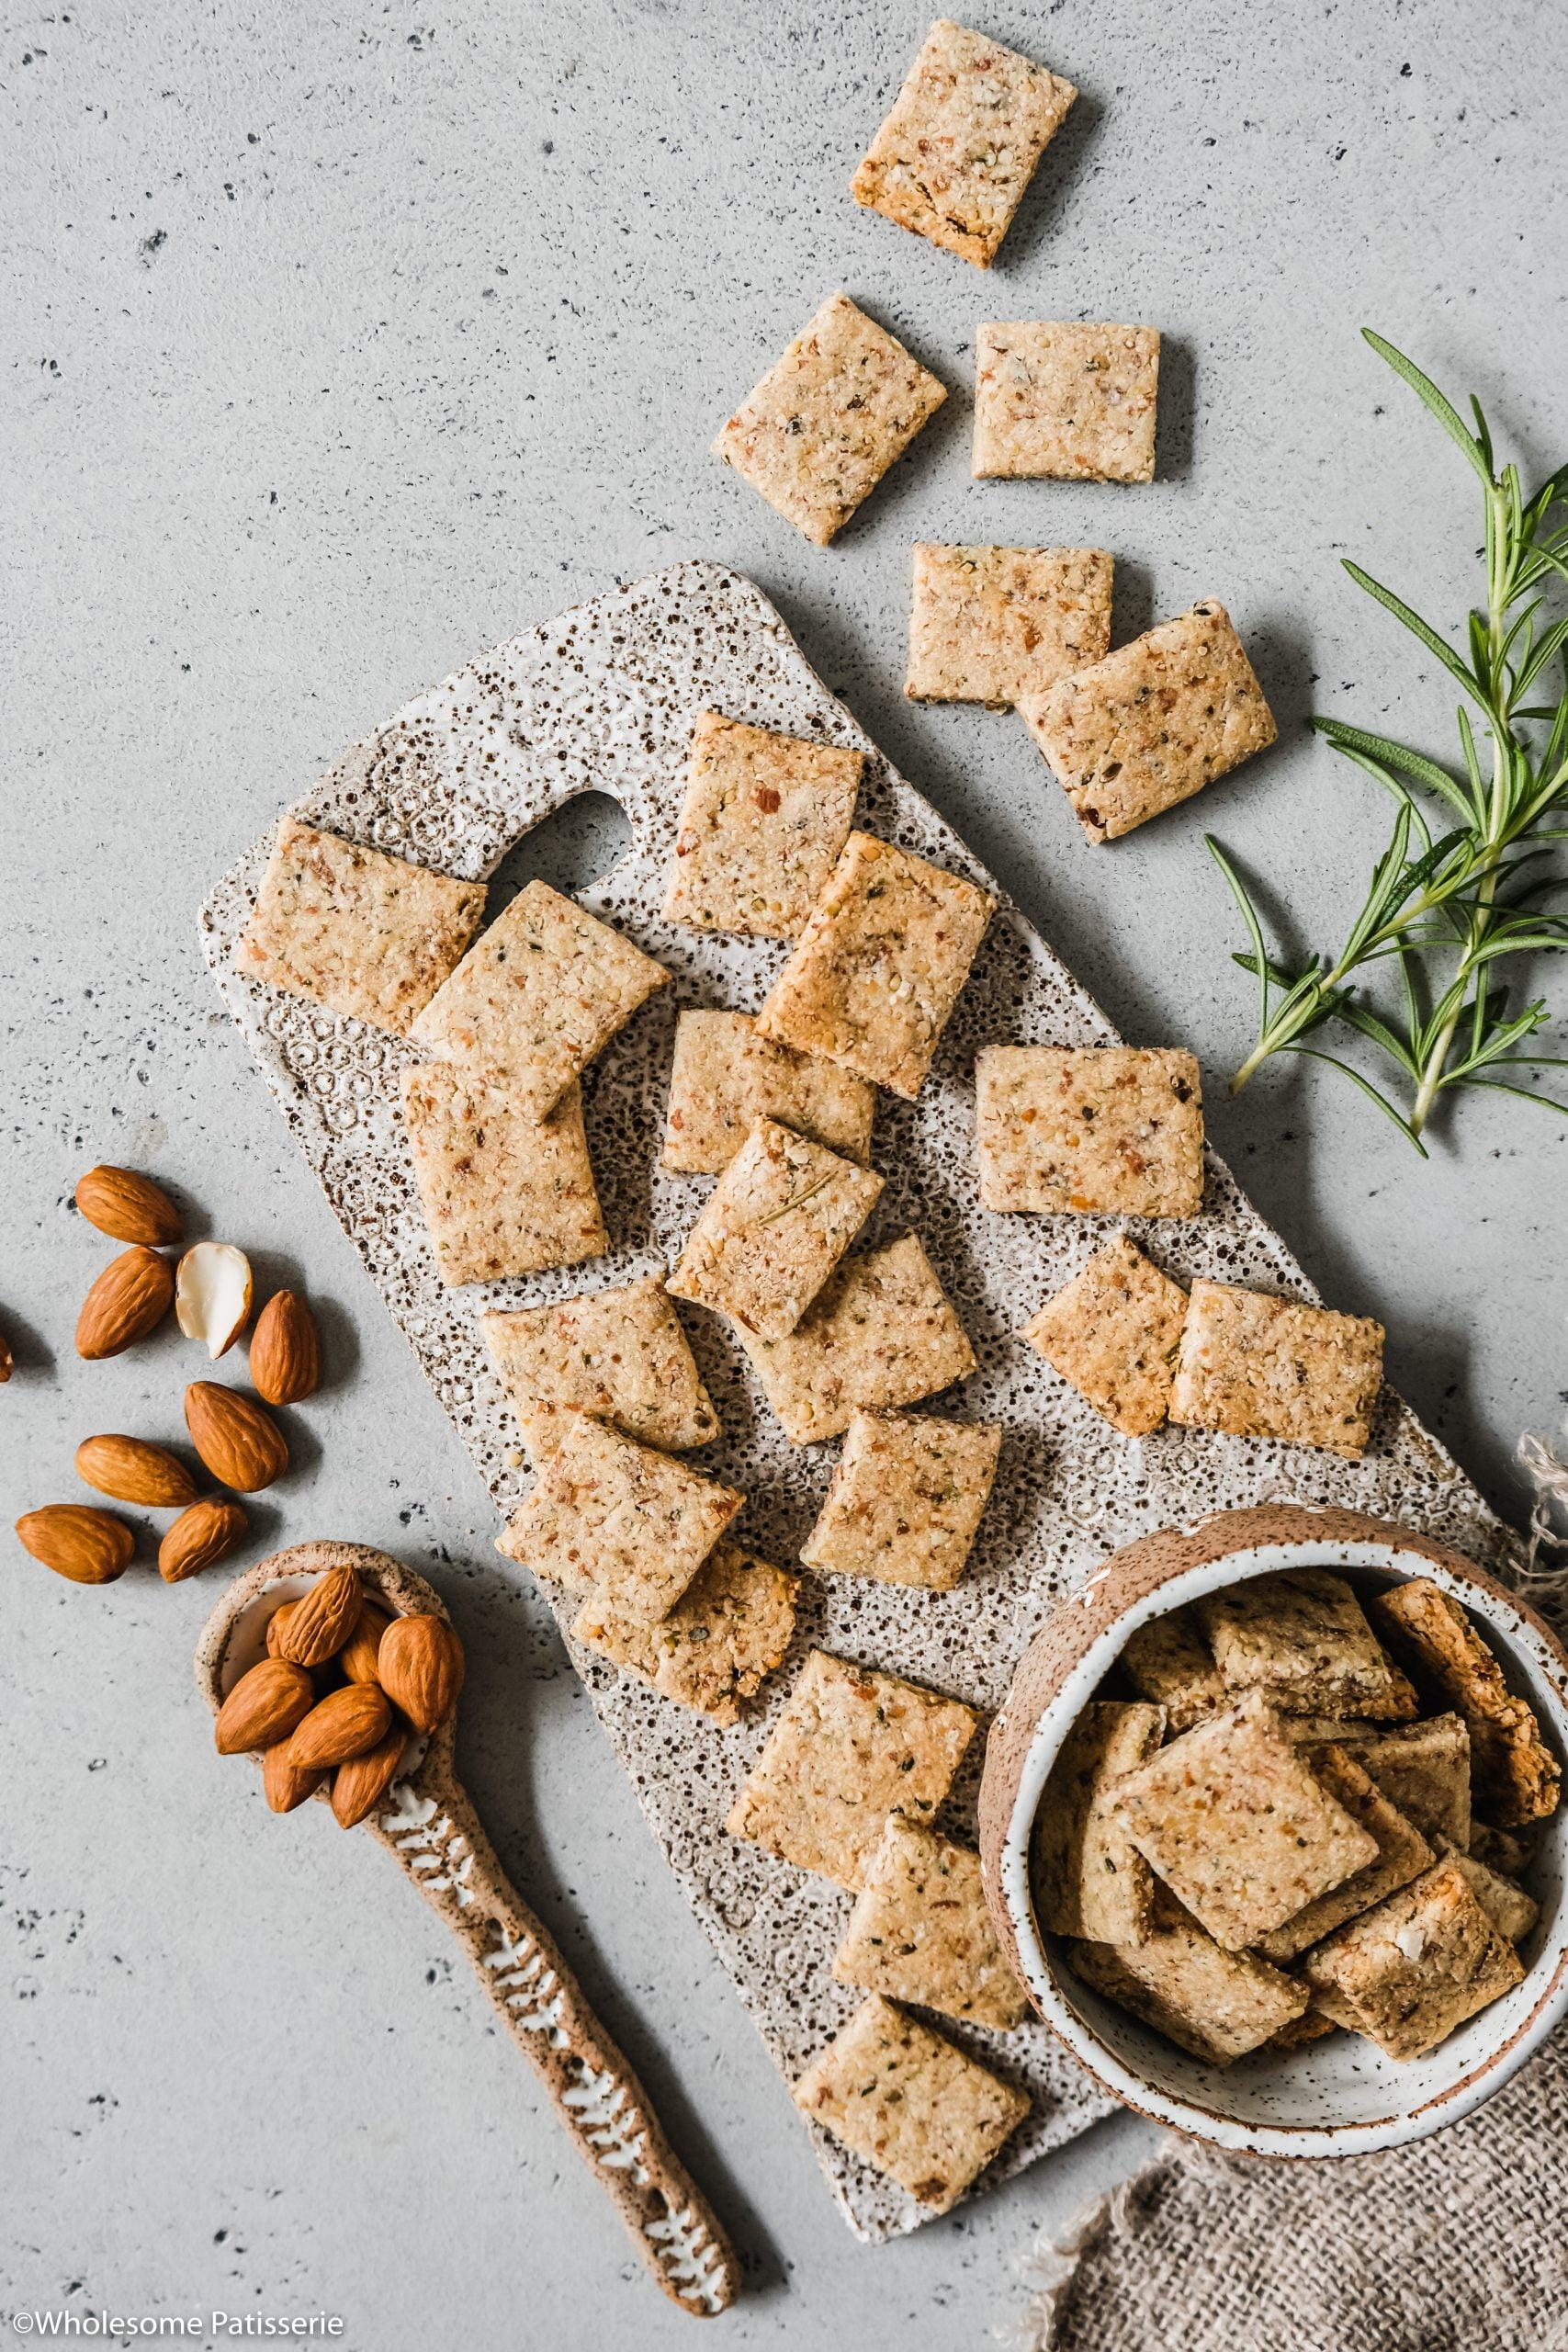 Almond Milk Pulp Crackers